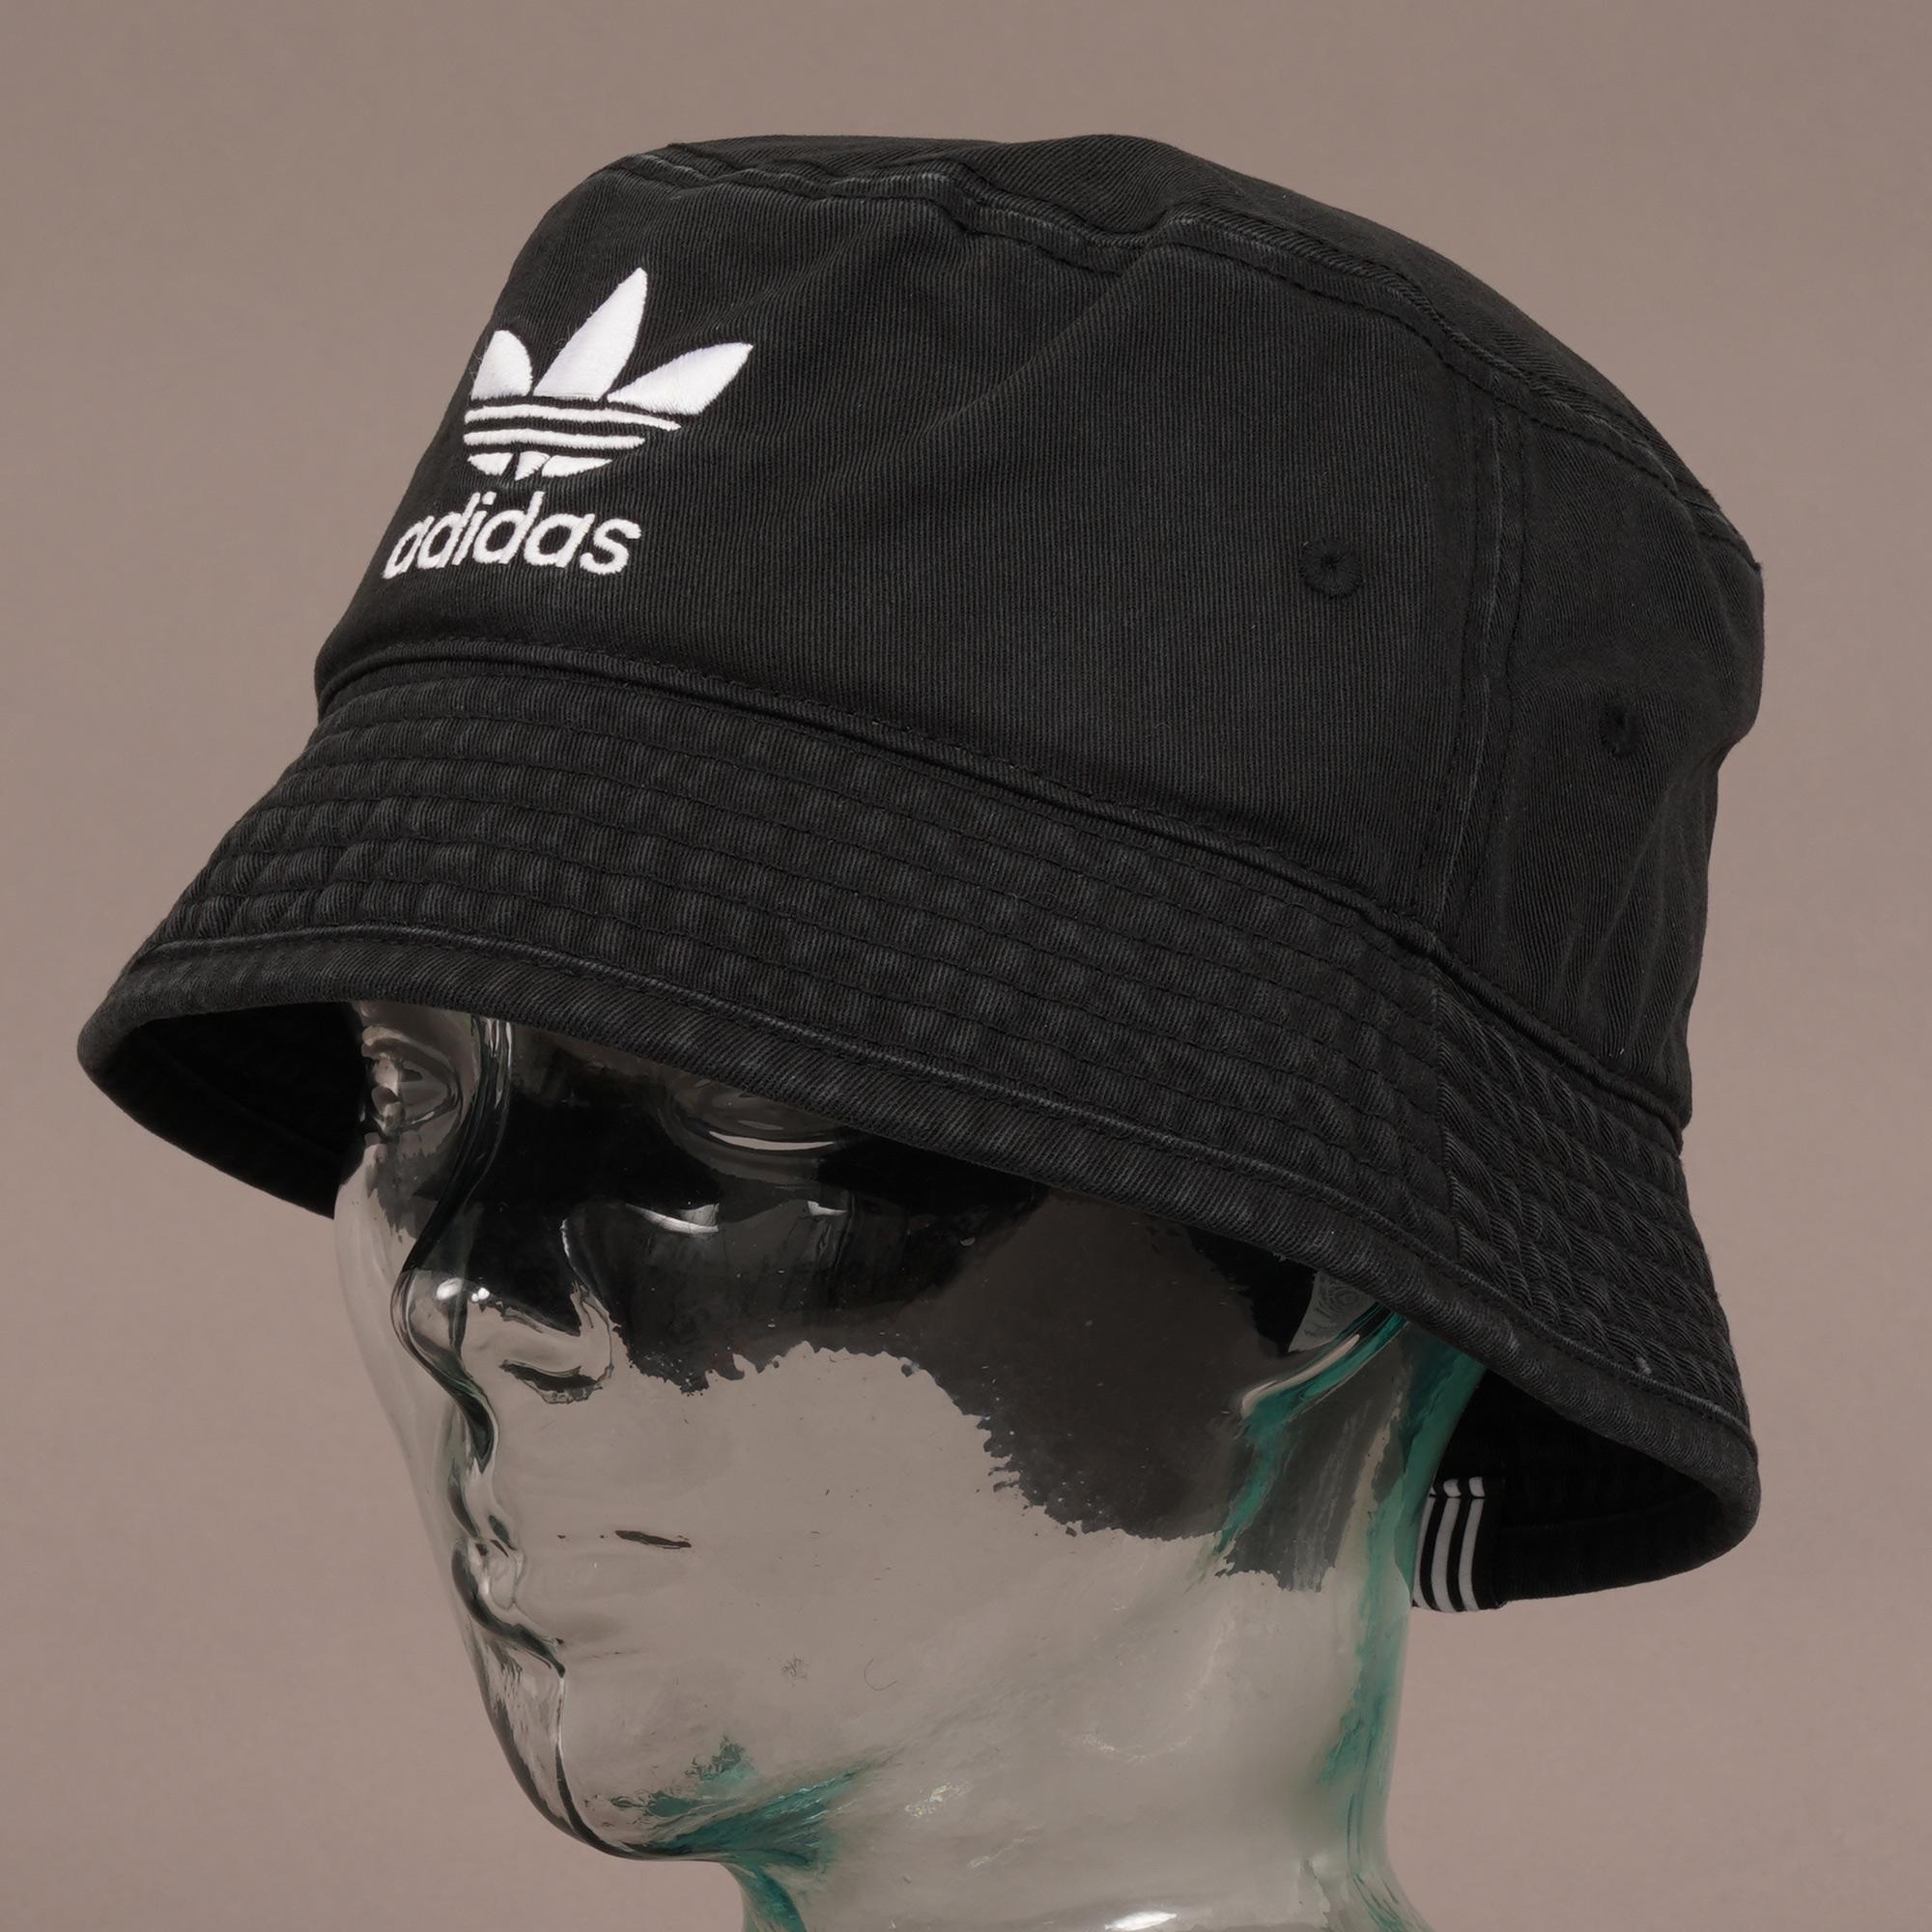 the latest 804b2 46bc1 Adidas Originals - Trefoil Bucket Hat - Black for Men - Lyst. View  fullscreen